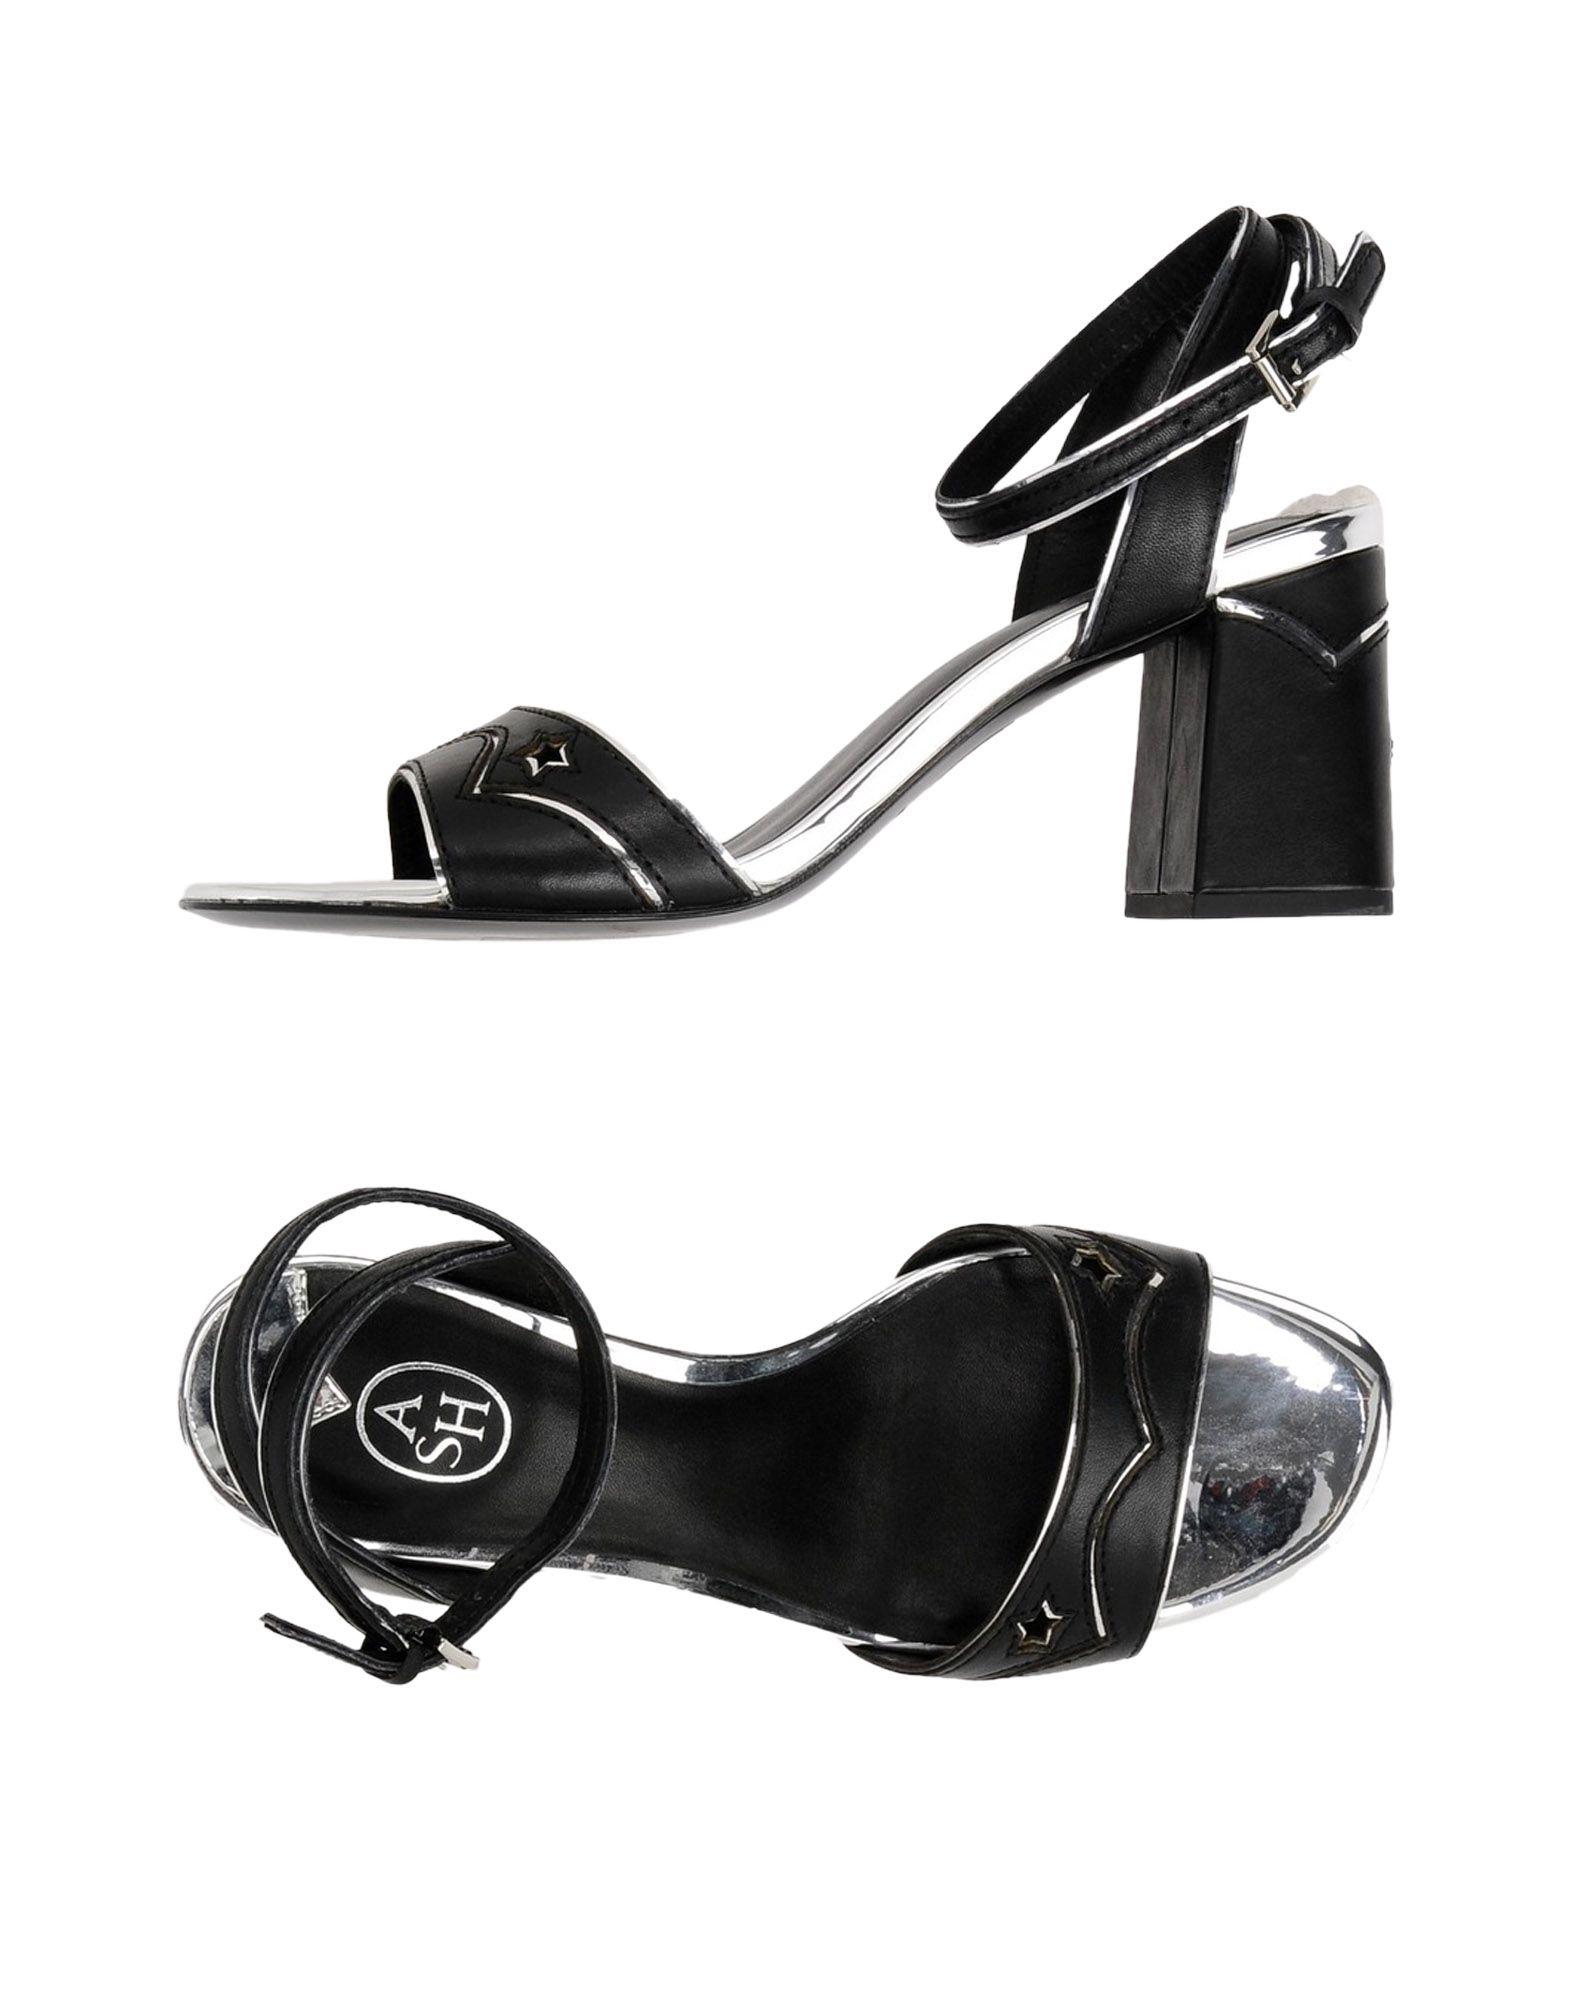 Ash Sandalen Damen  11383778TI Gute Qualität beliebte Schuhe